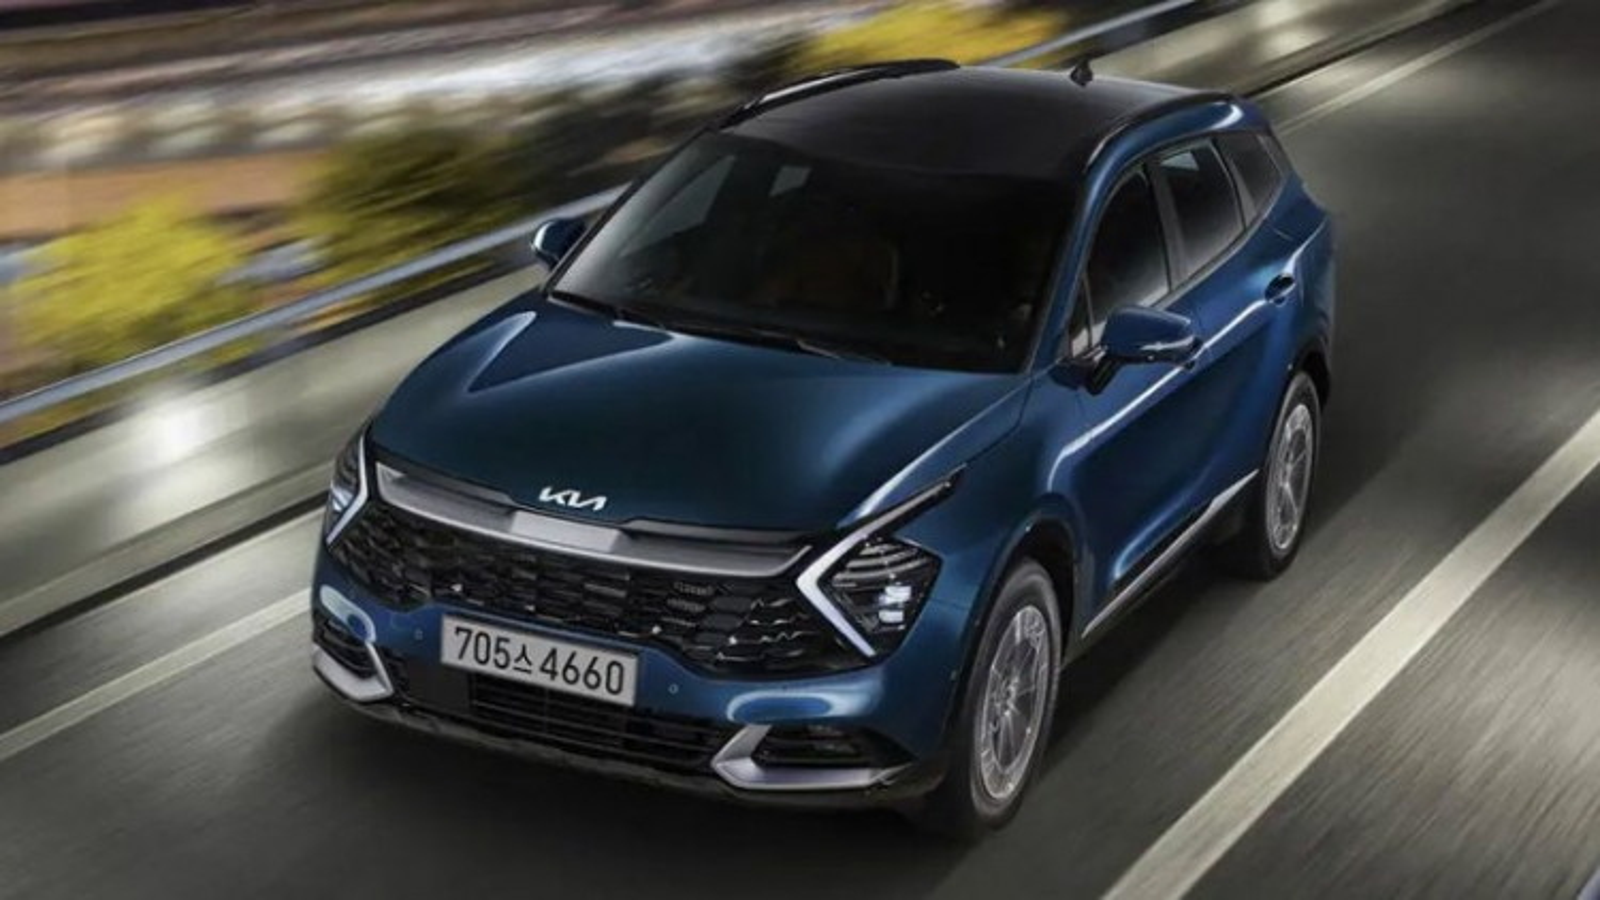 Kia Sportage Hybrid 2021 ra mắt tại Hàn Quốc